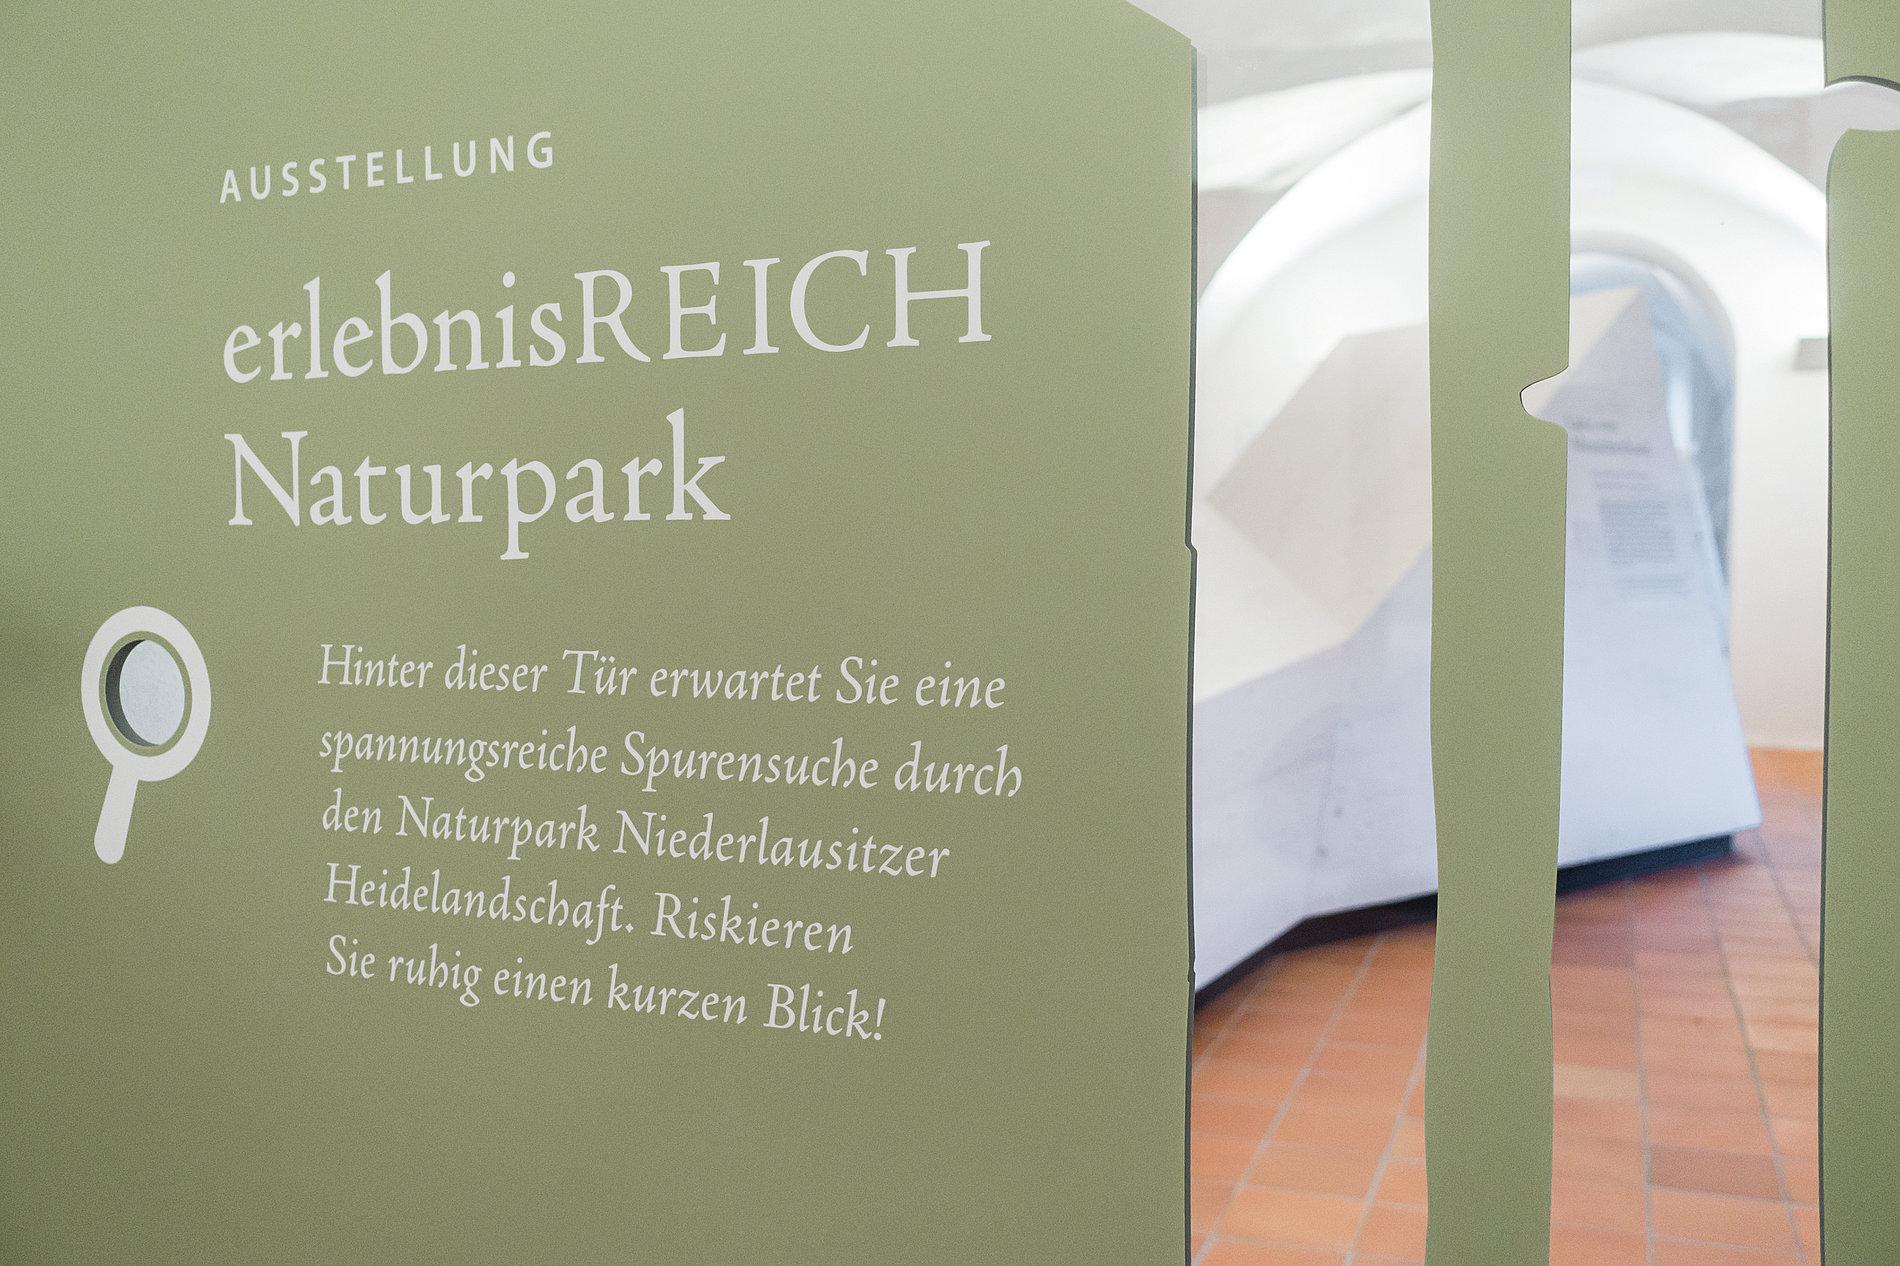 erlebnisREICH Naturpark | Red Dot Design Award